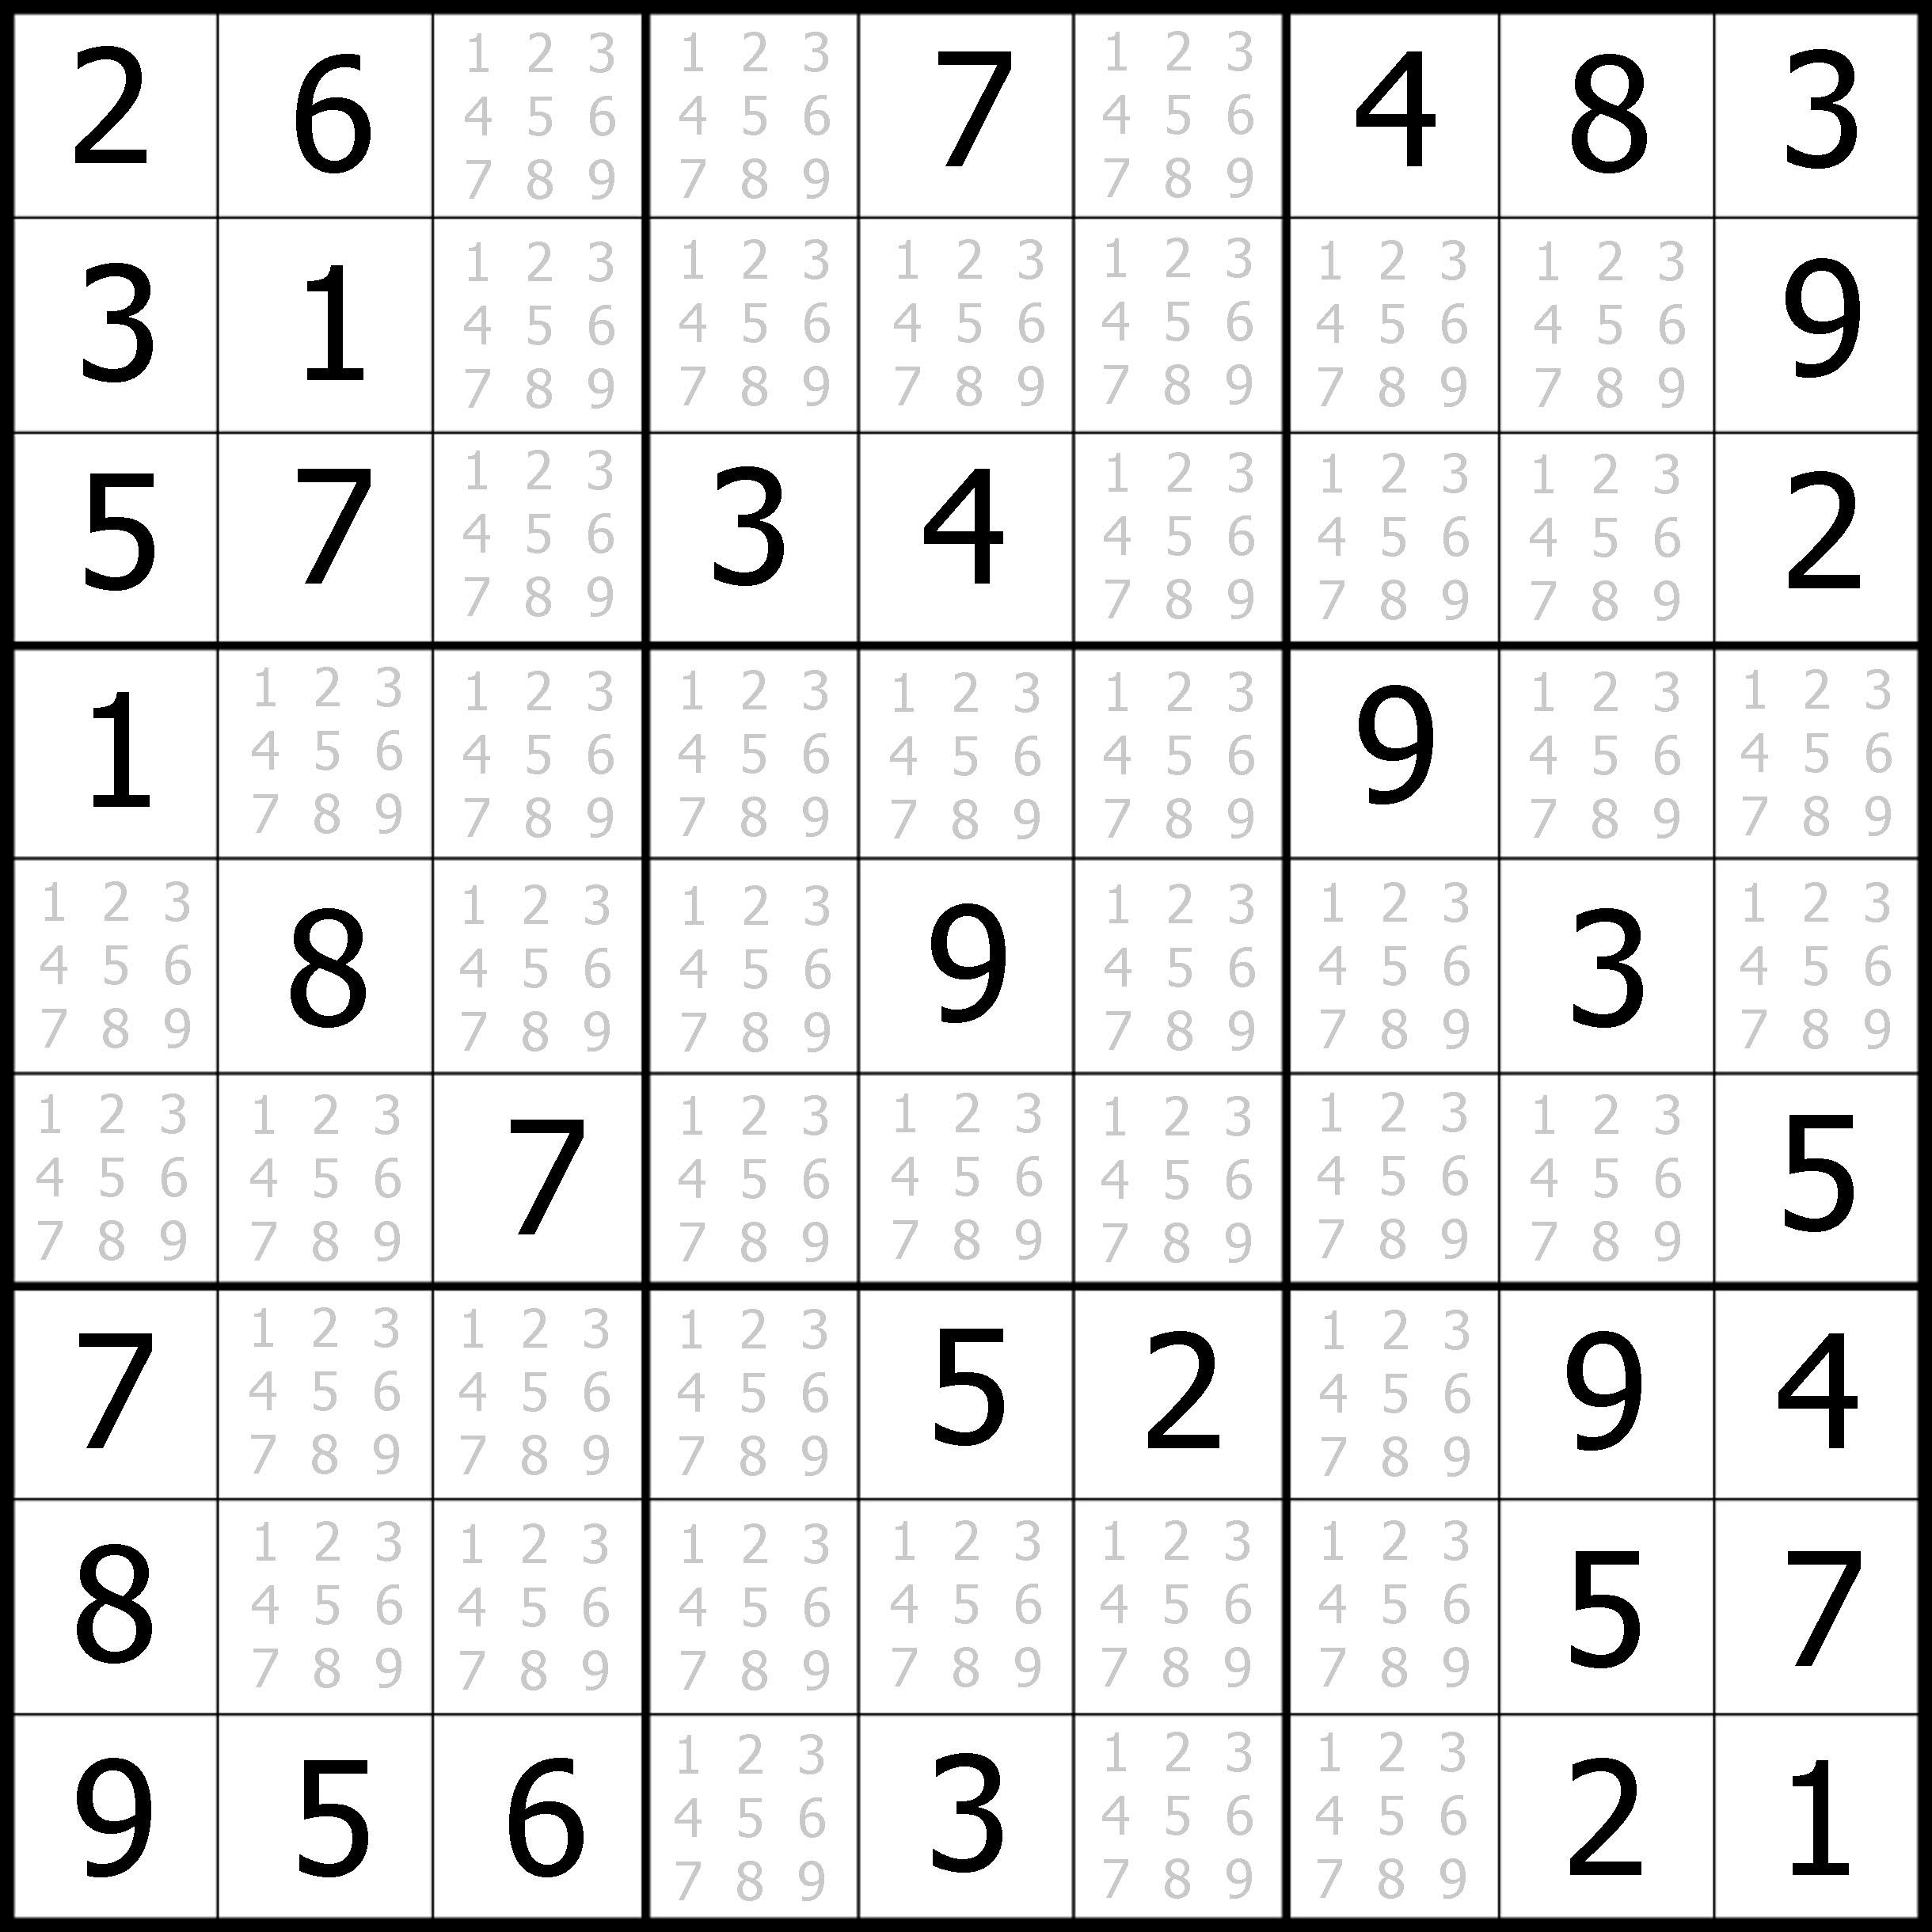 Easy Sudoku Printable | Kids Activities - Printable Puzzles Sudoku